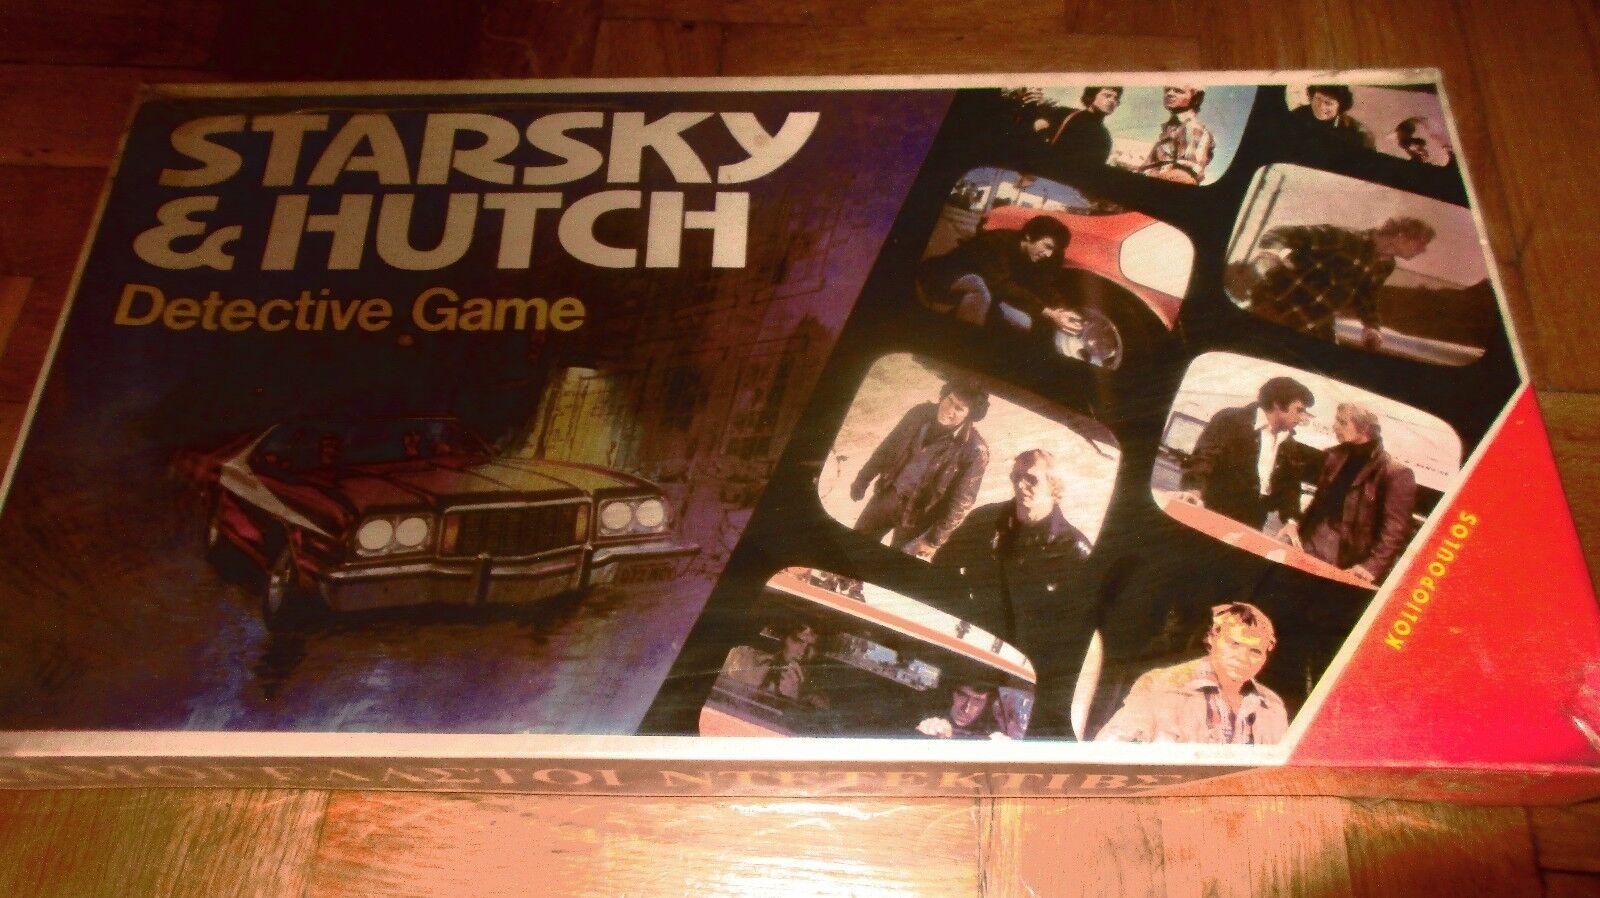 VINTAGE RARE GREEK DETECTIVE BOARD GAME STARSKY & HUTCH TV POLICE SHOW SEALED